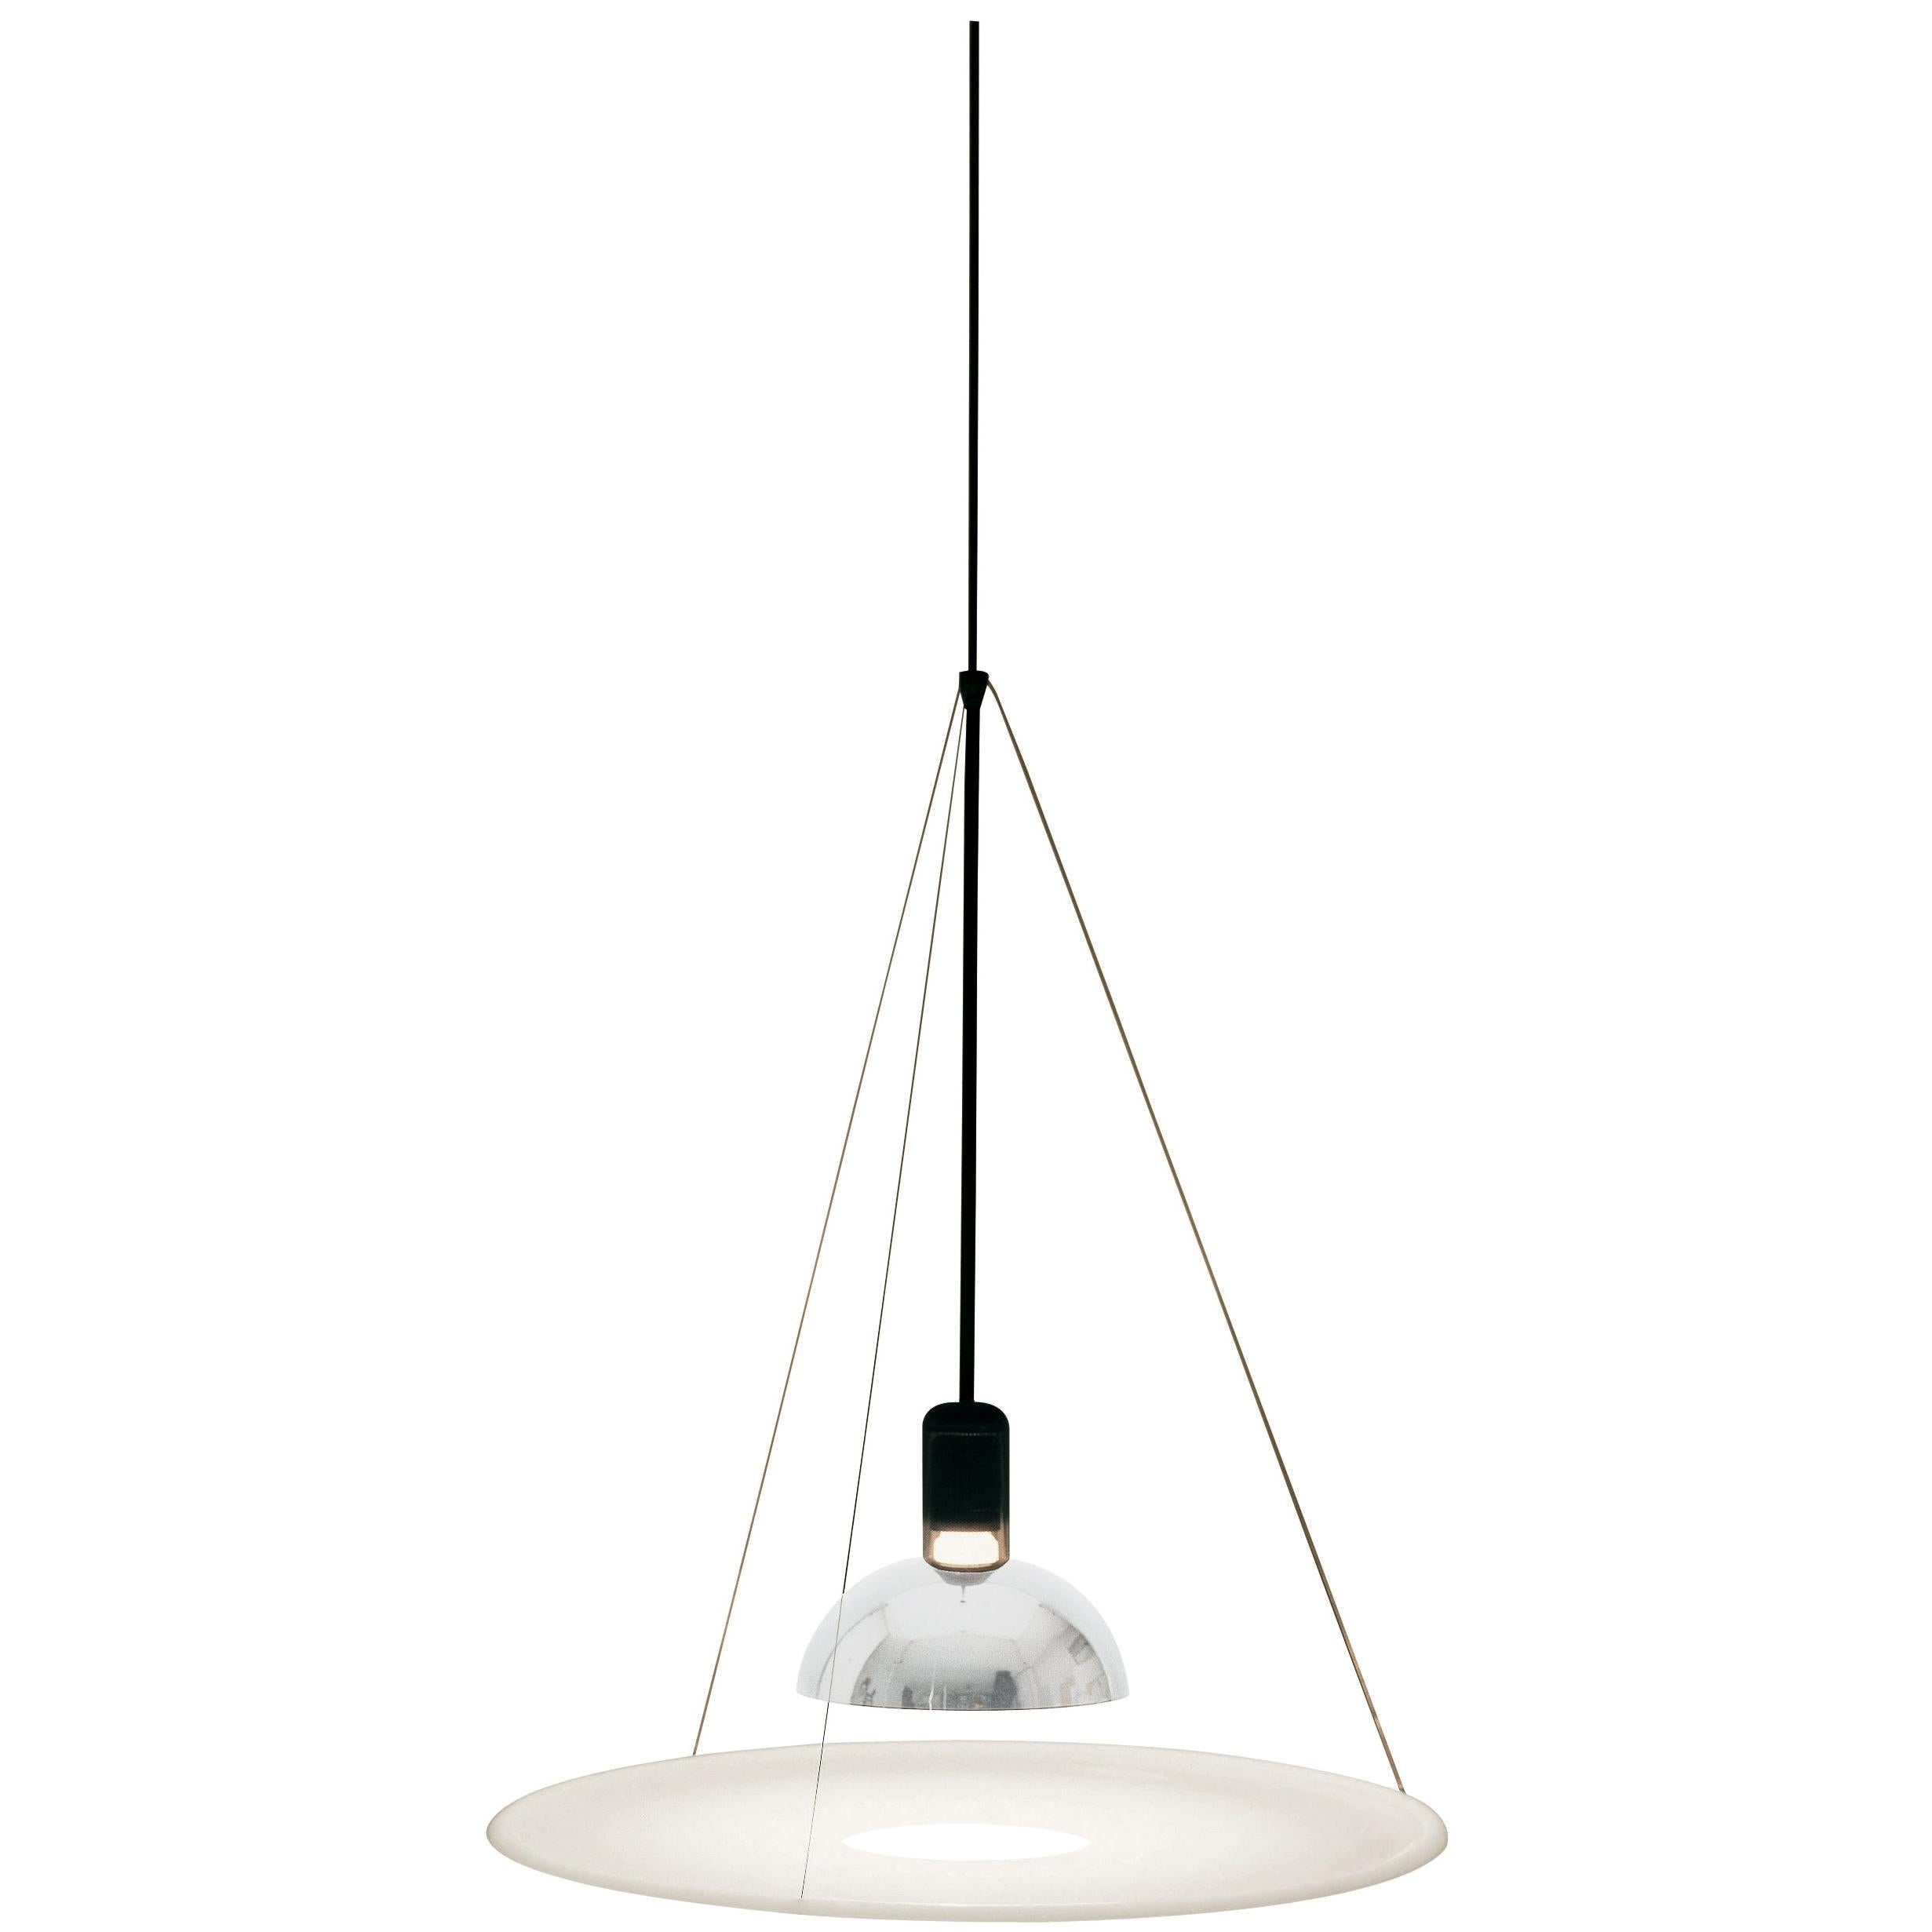 FLOS Frisbi Pendant Light in Nickel by Achille Castiglioni